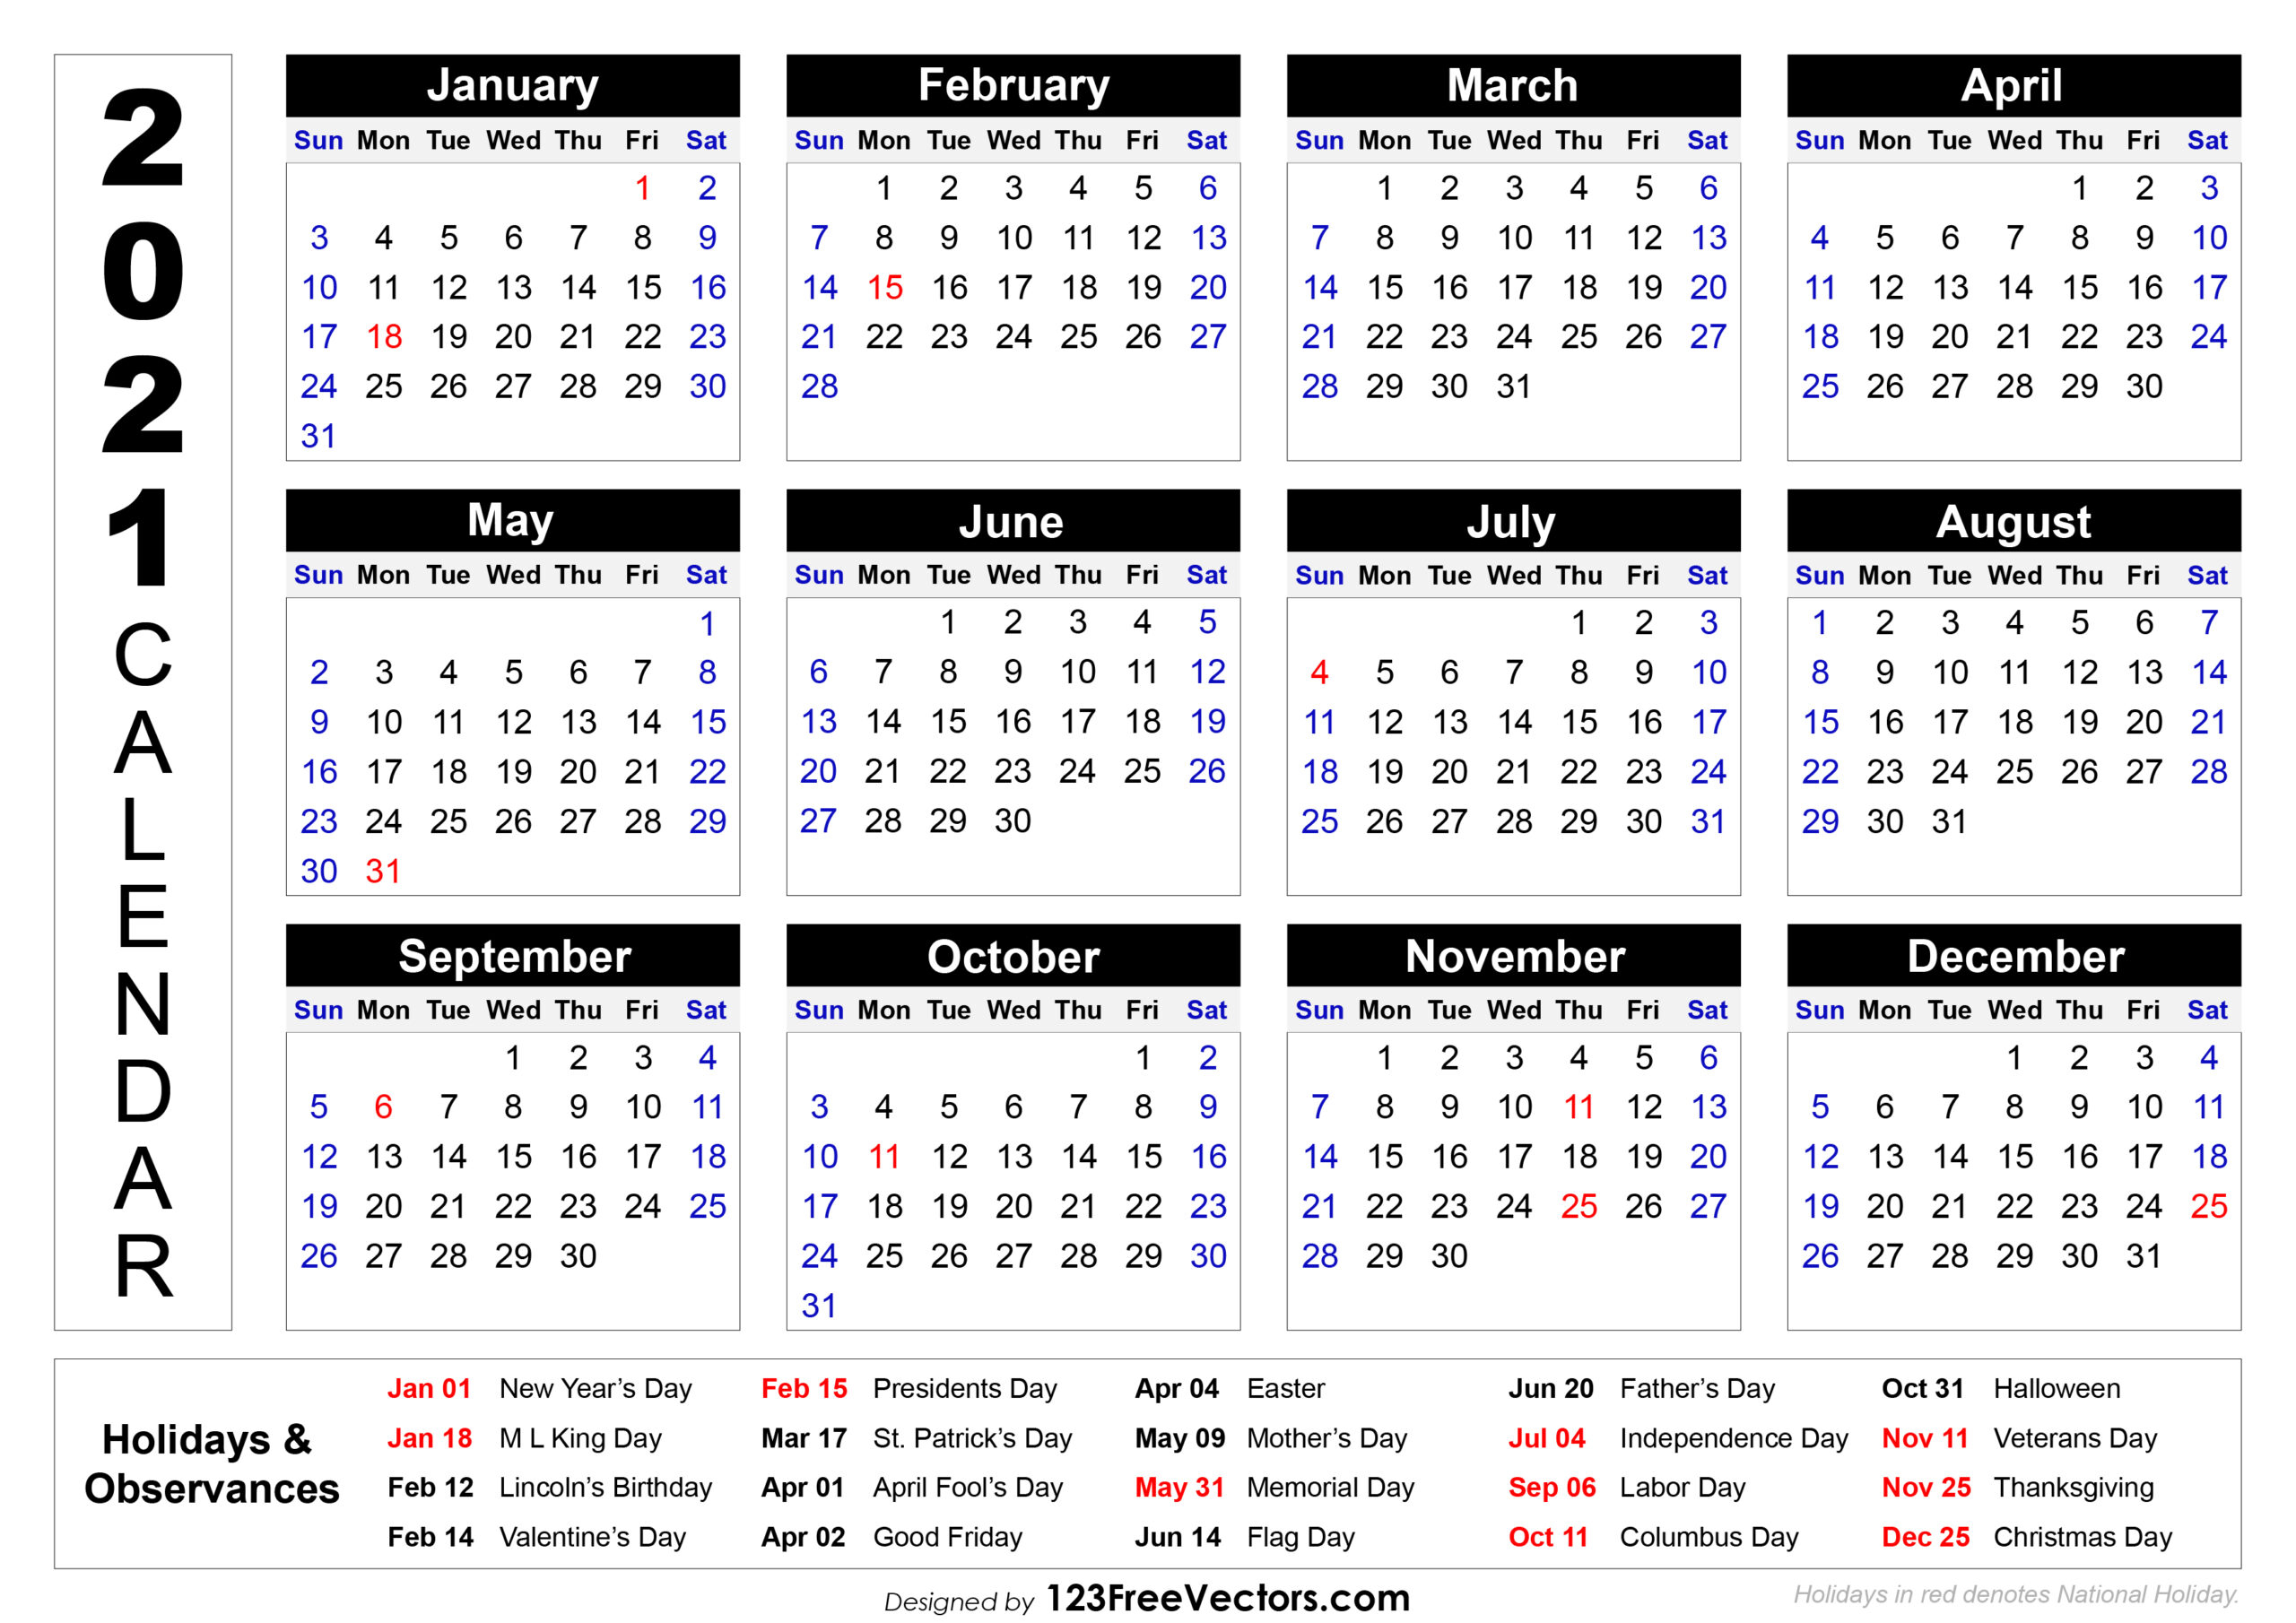 2021 Calendar Holidays And Observances | Printable Calendars 2021